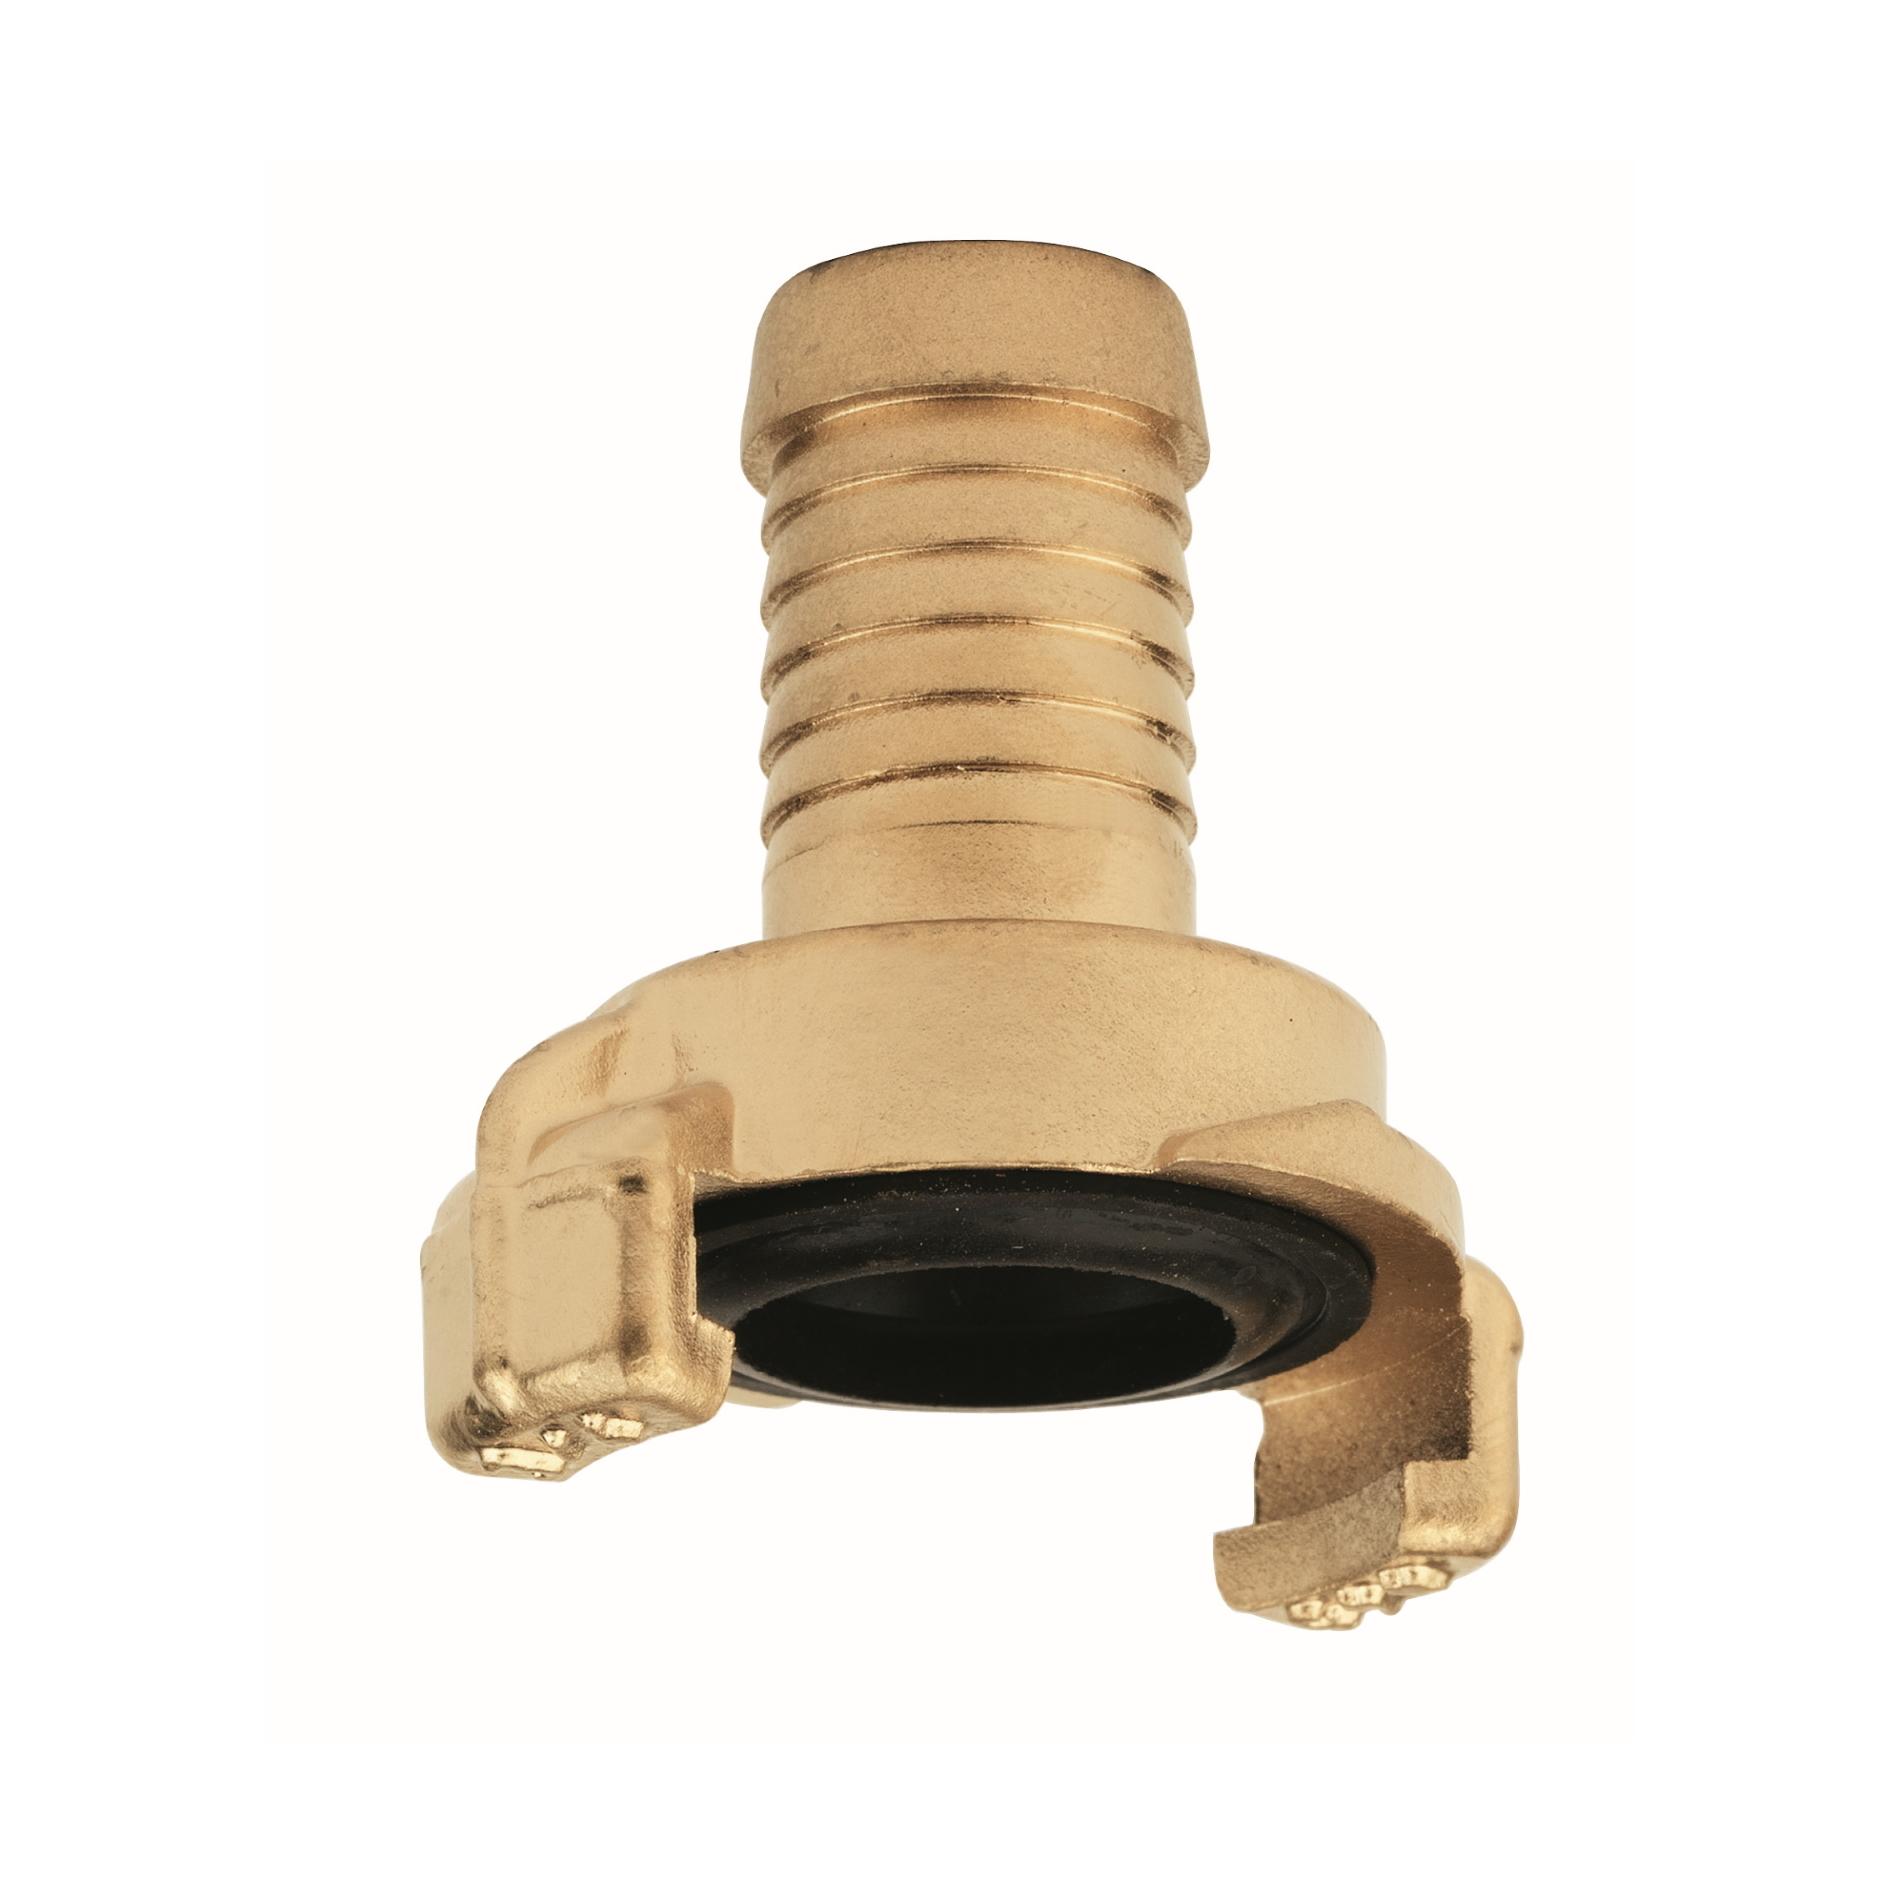 988 Raccordo rapido portagomma Quick coupling with hose union